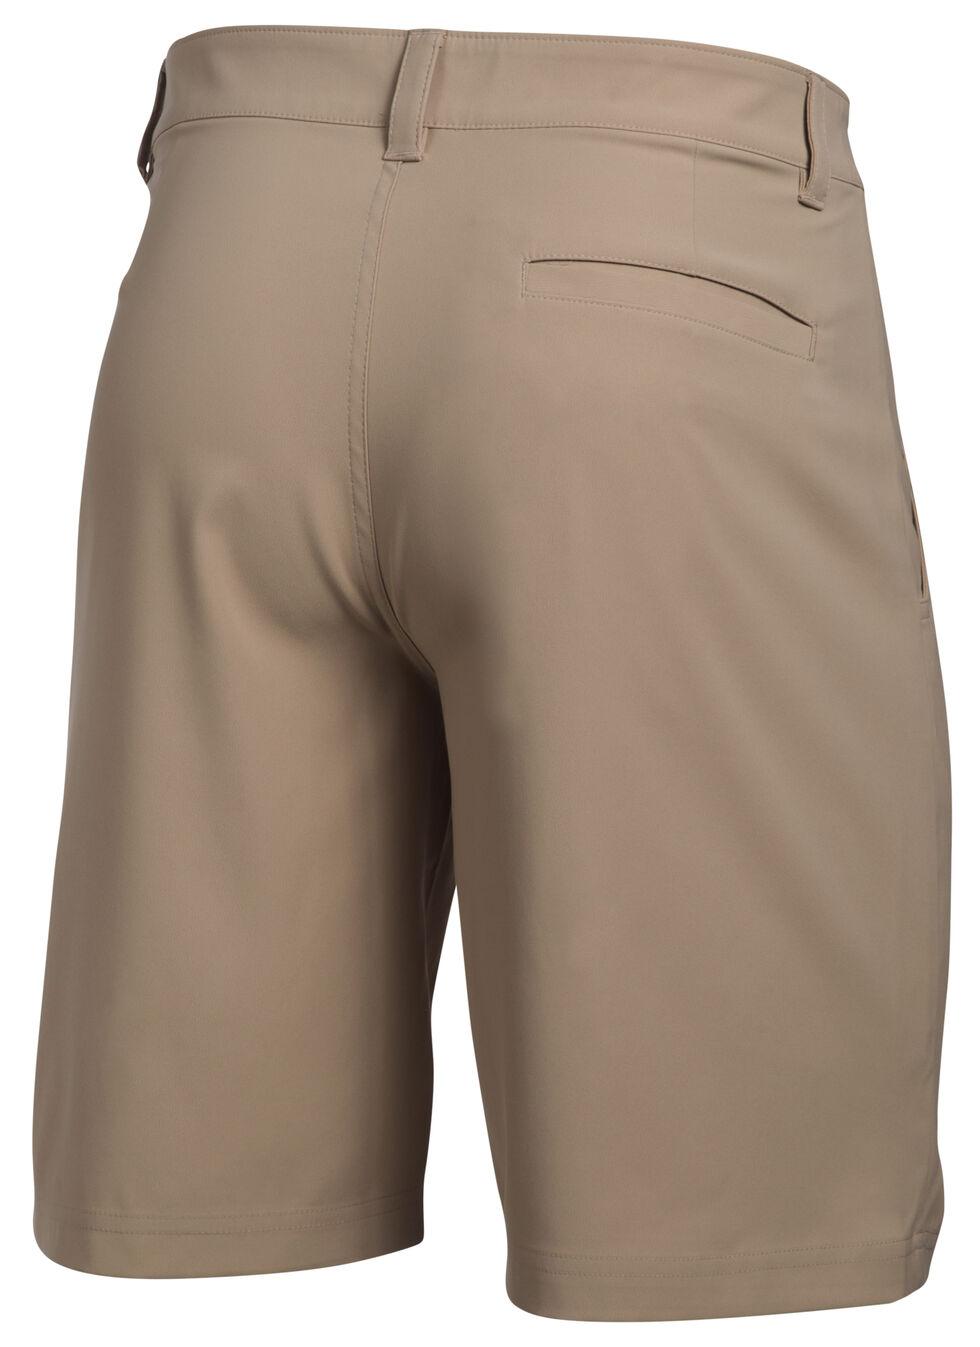 Under Armour Men's Fish Hunter Flat Front Shorts, Sand, hi-res